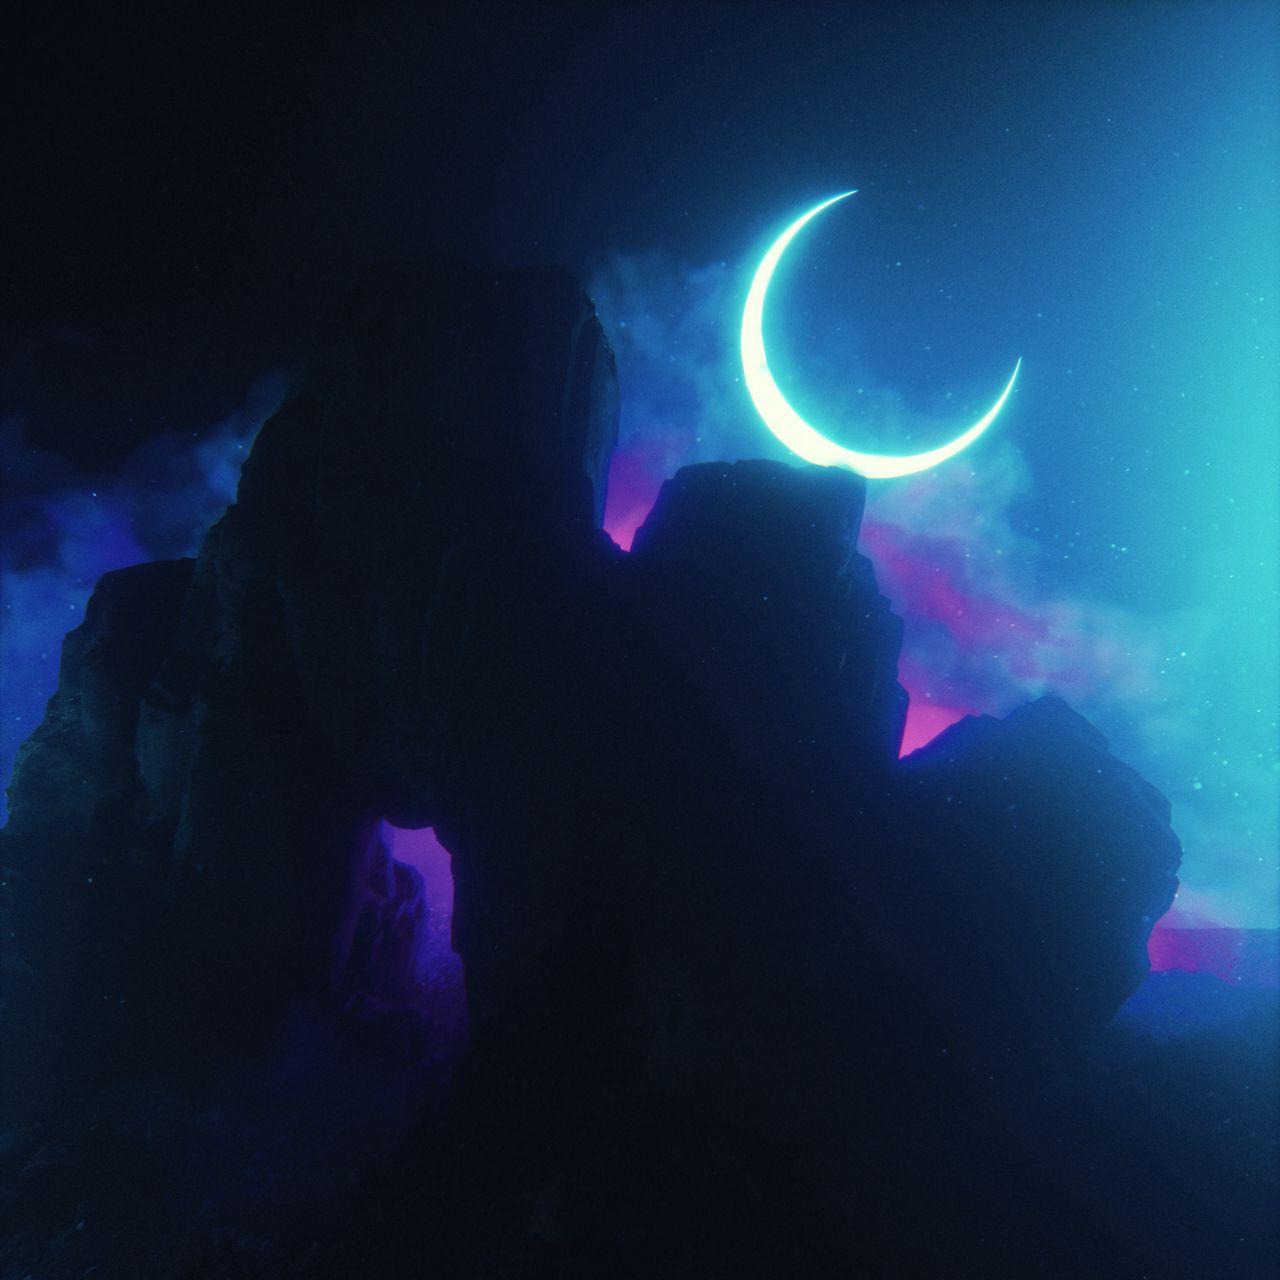 1280x1280 Wallpaper rock, neon, smoke, moon, light, bright